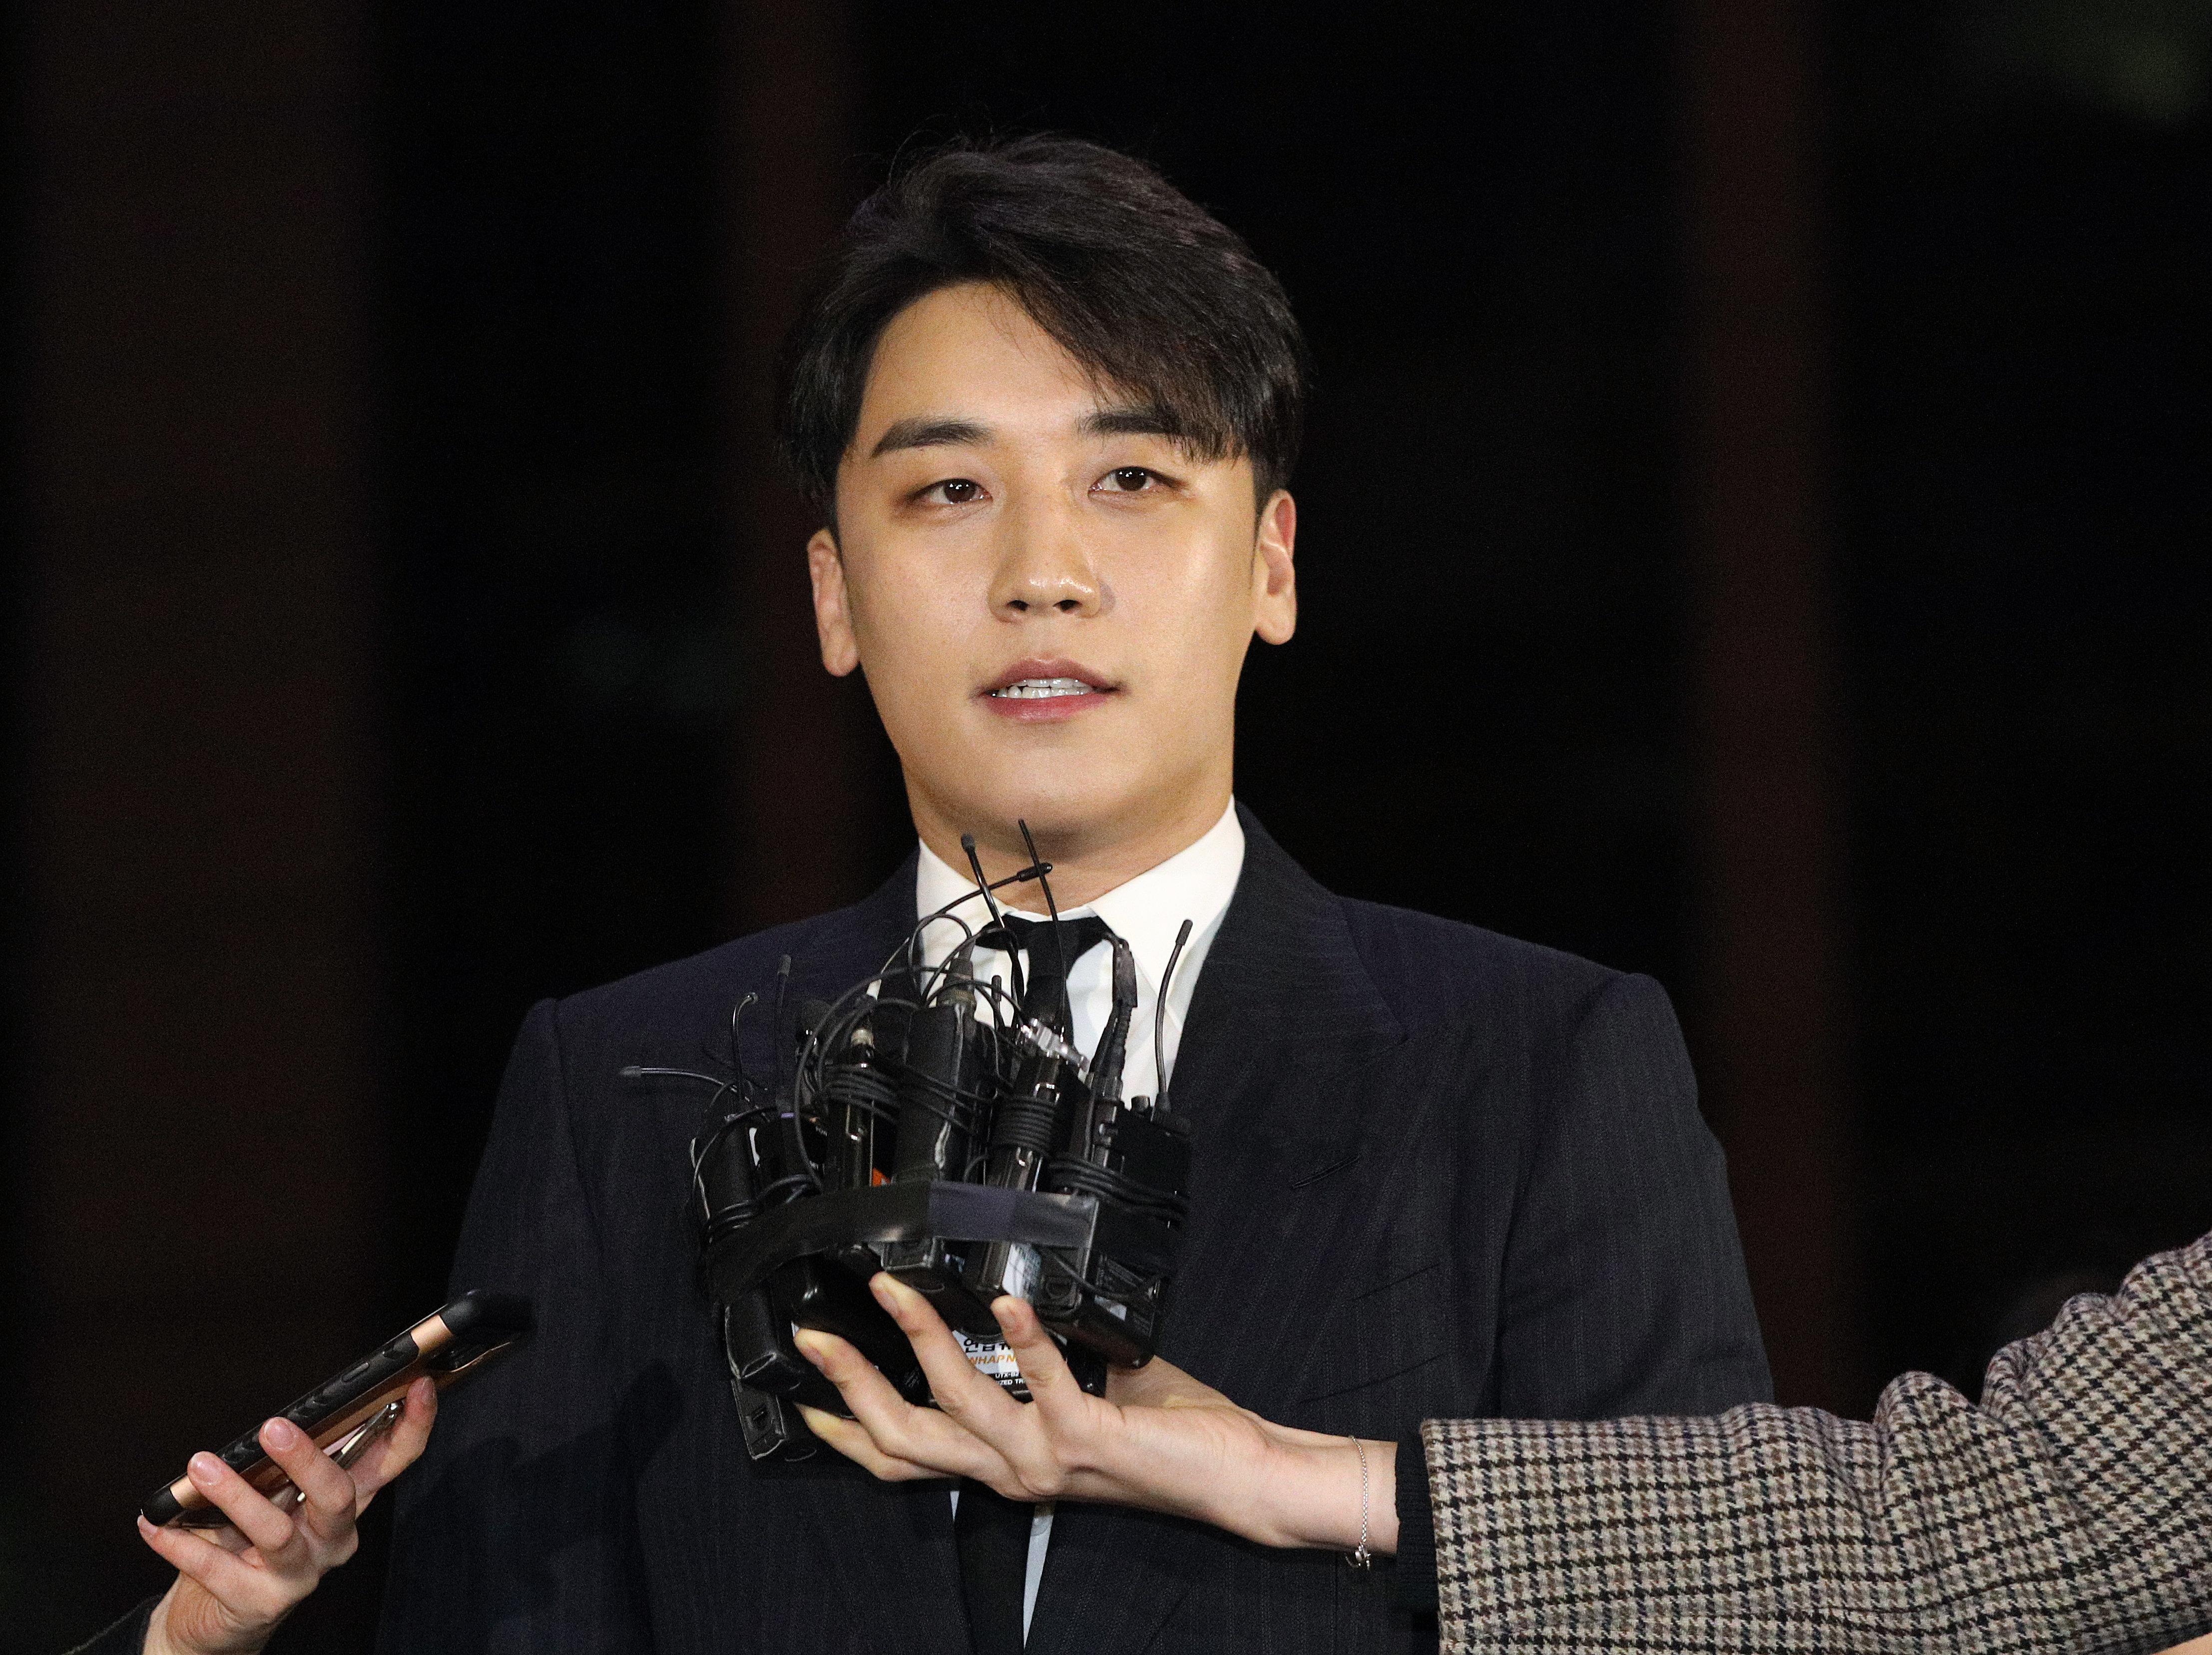 YG엔터테인먼트 관계자가 '승리 은퇴 발표'에 대해 입을